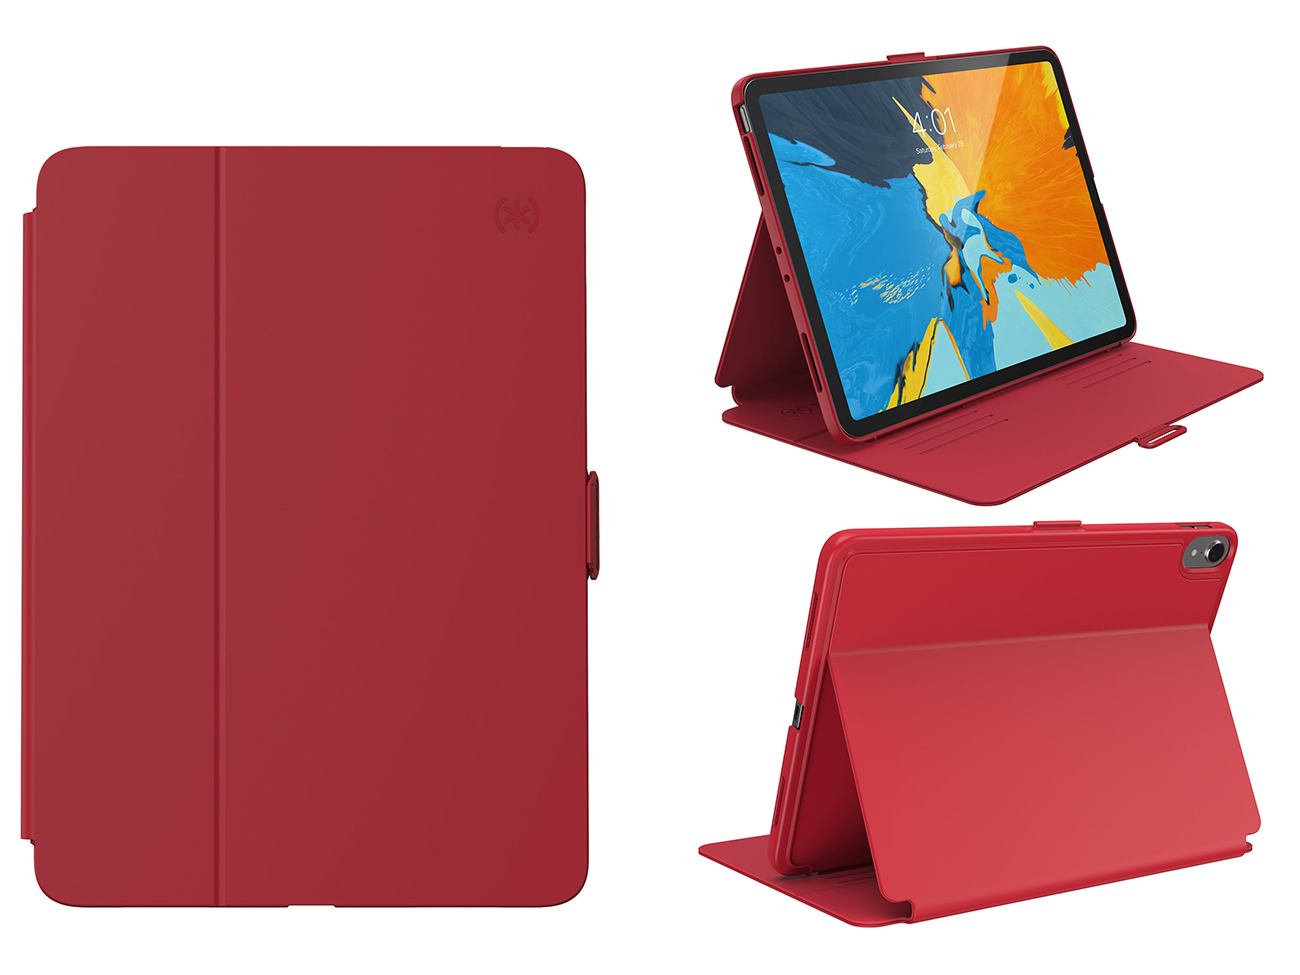 Kopia - Speck Balance Folio Clear Etui Pokrowiec iPad Pro 11